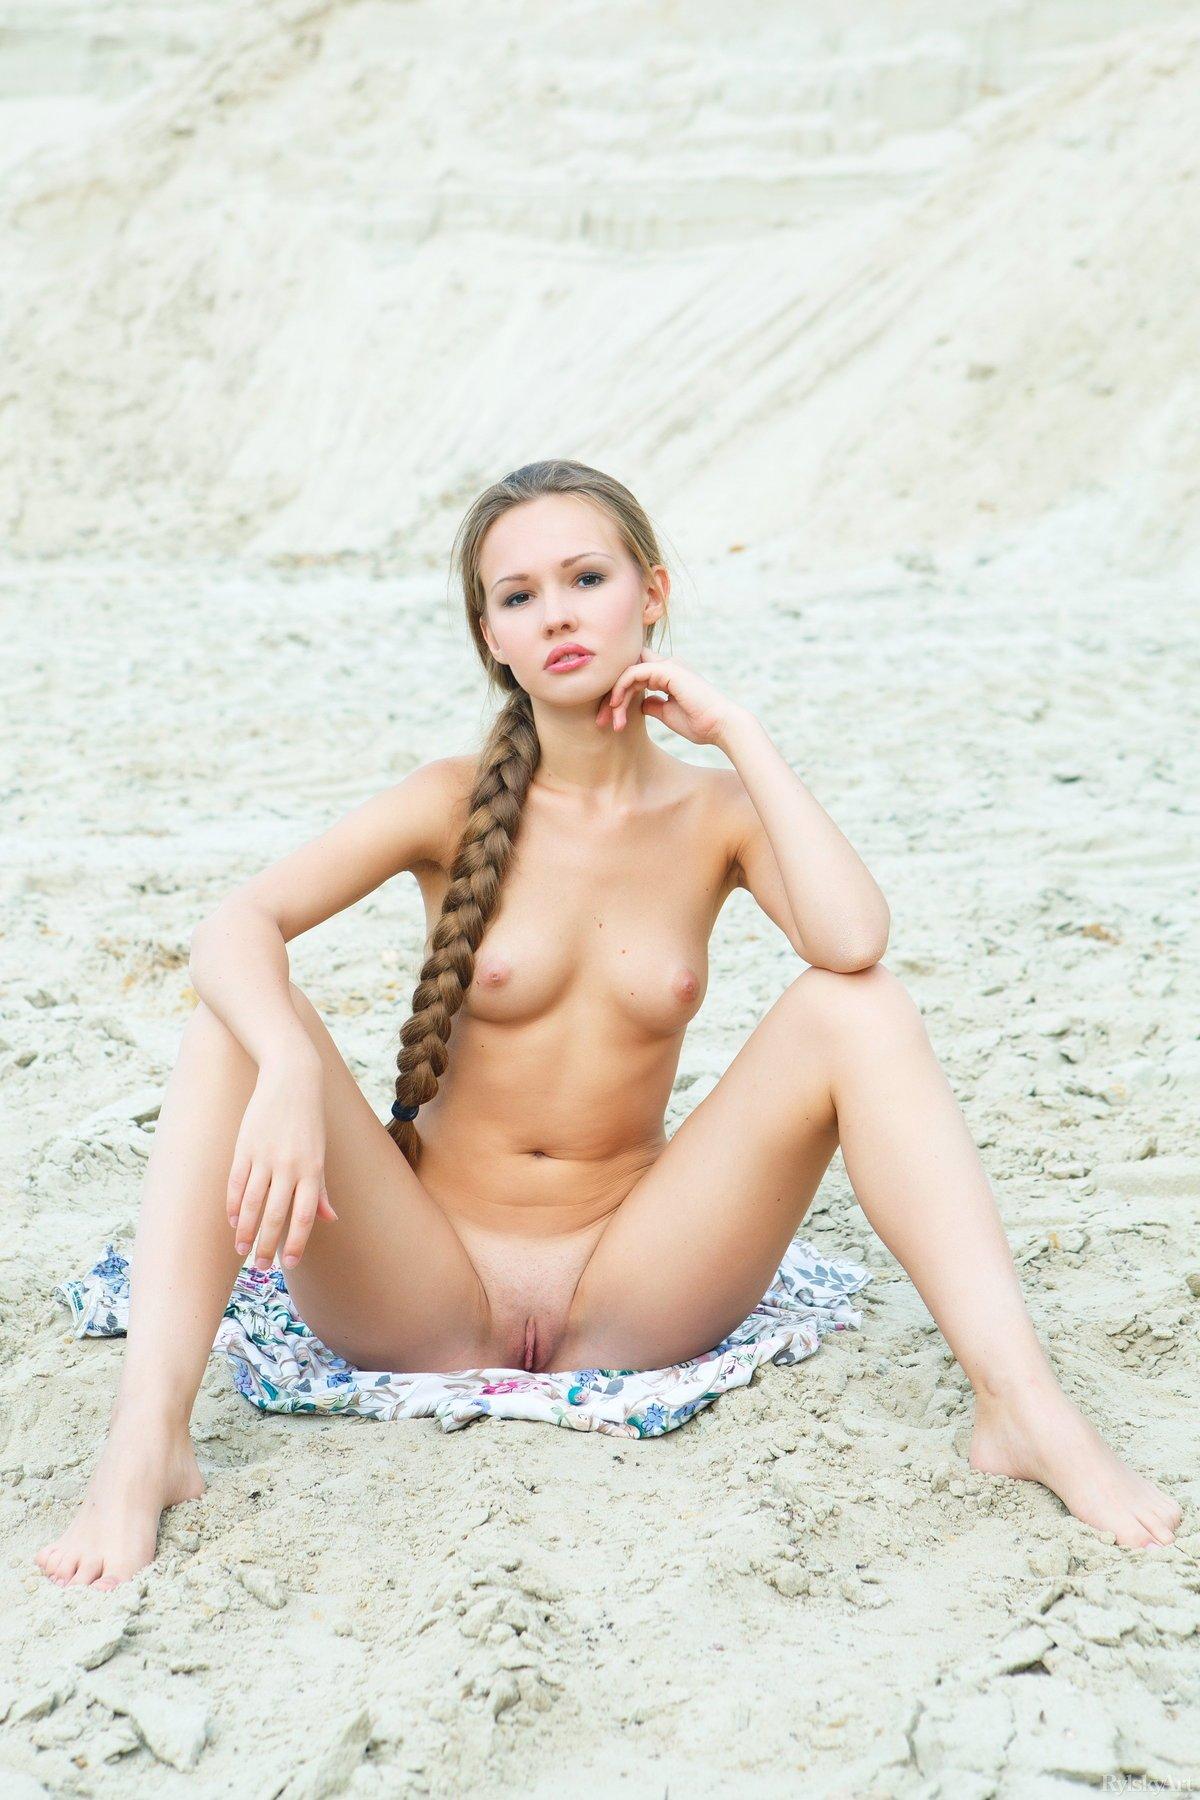 Virginia Sun Aka Tanja Kuznecova